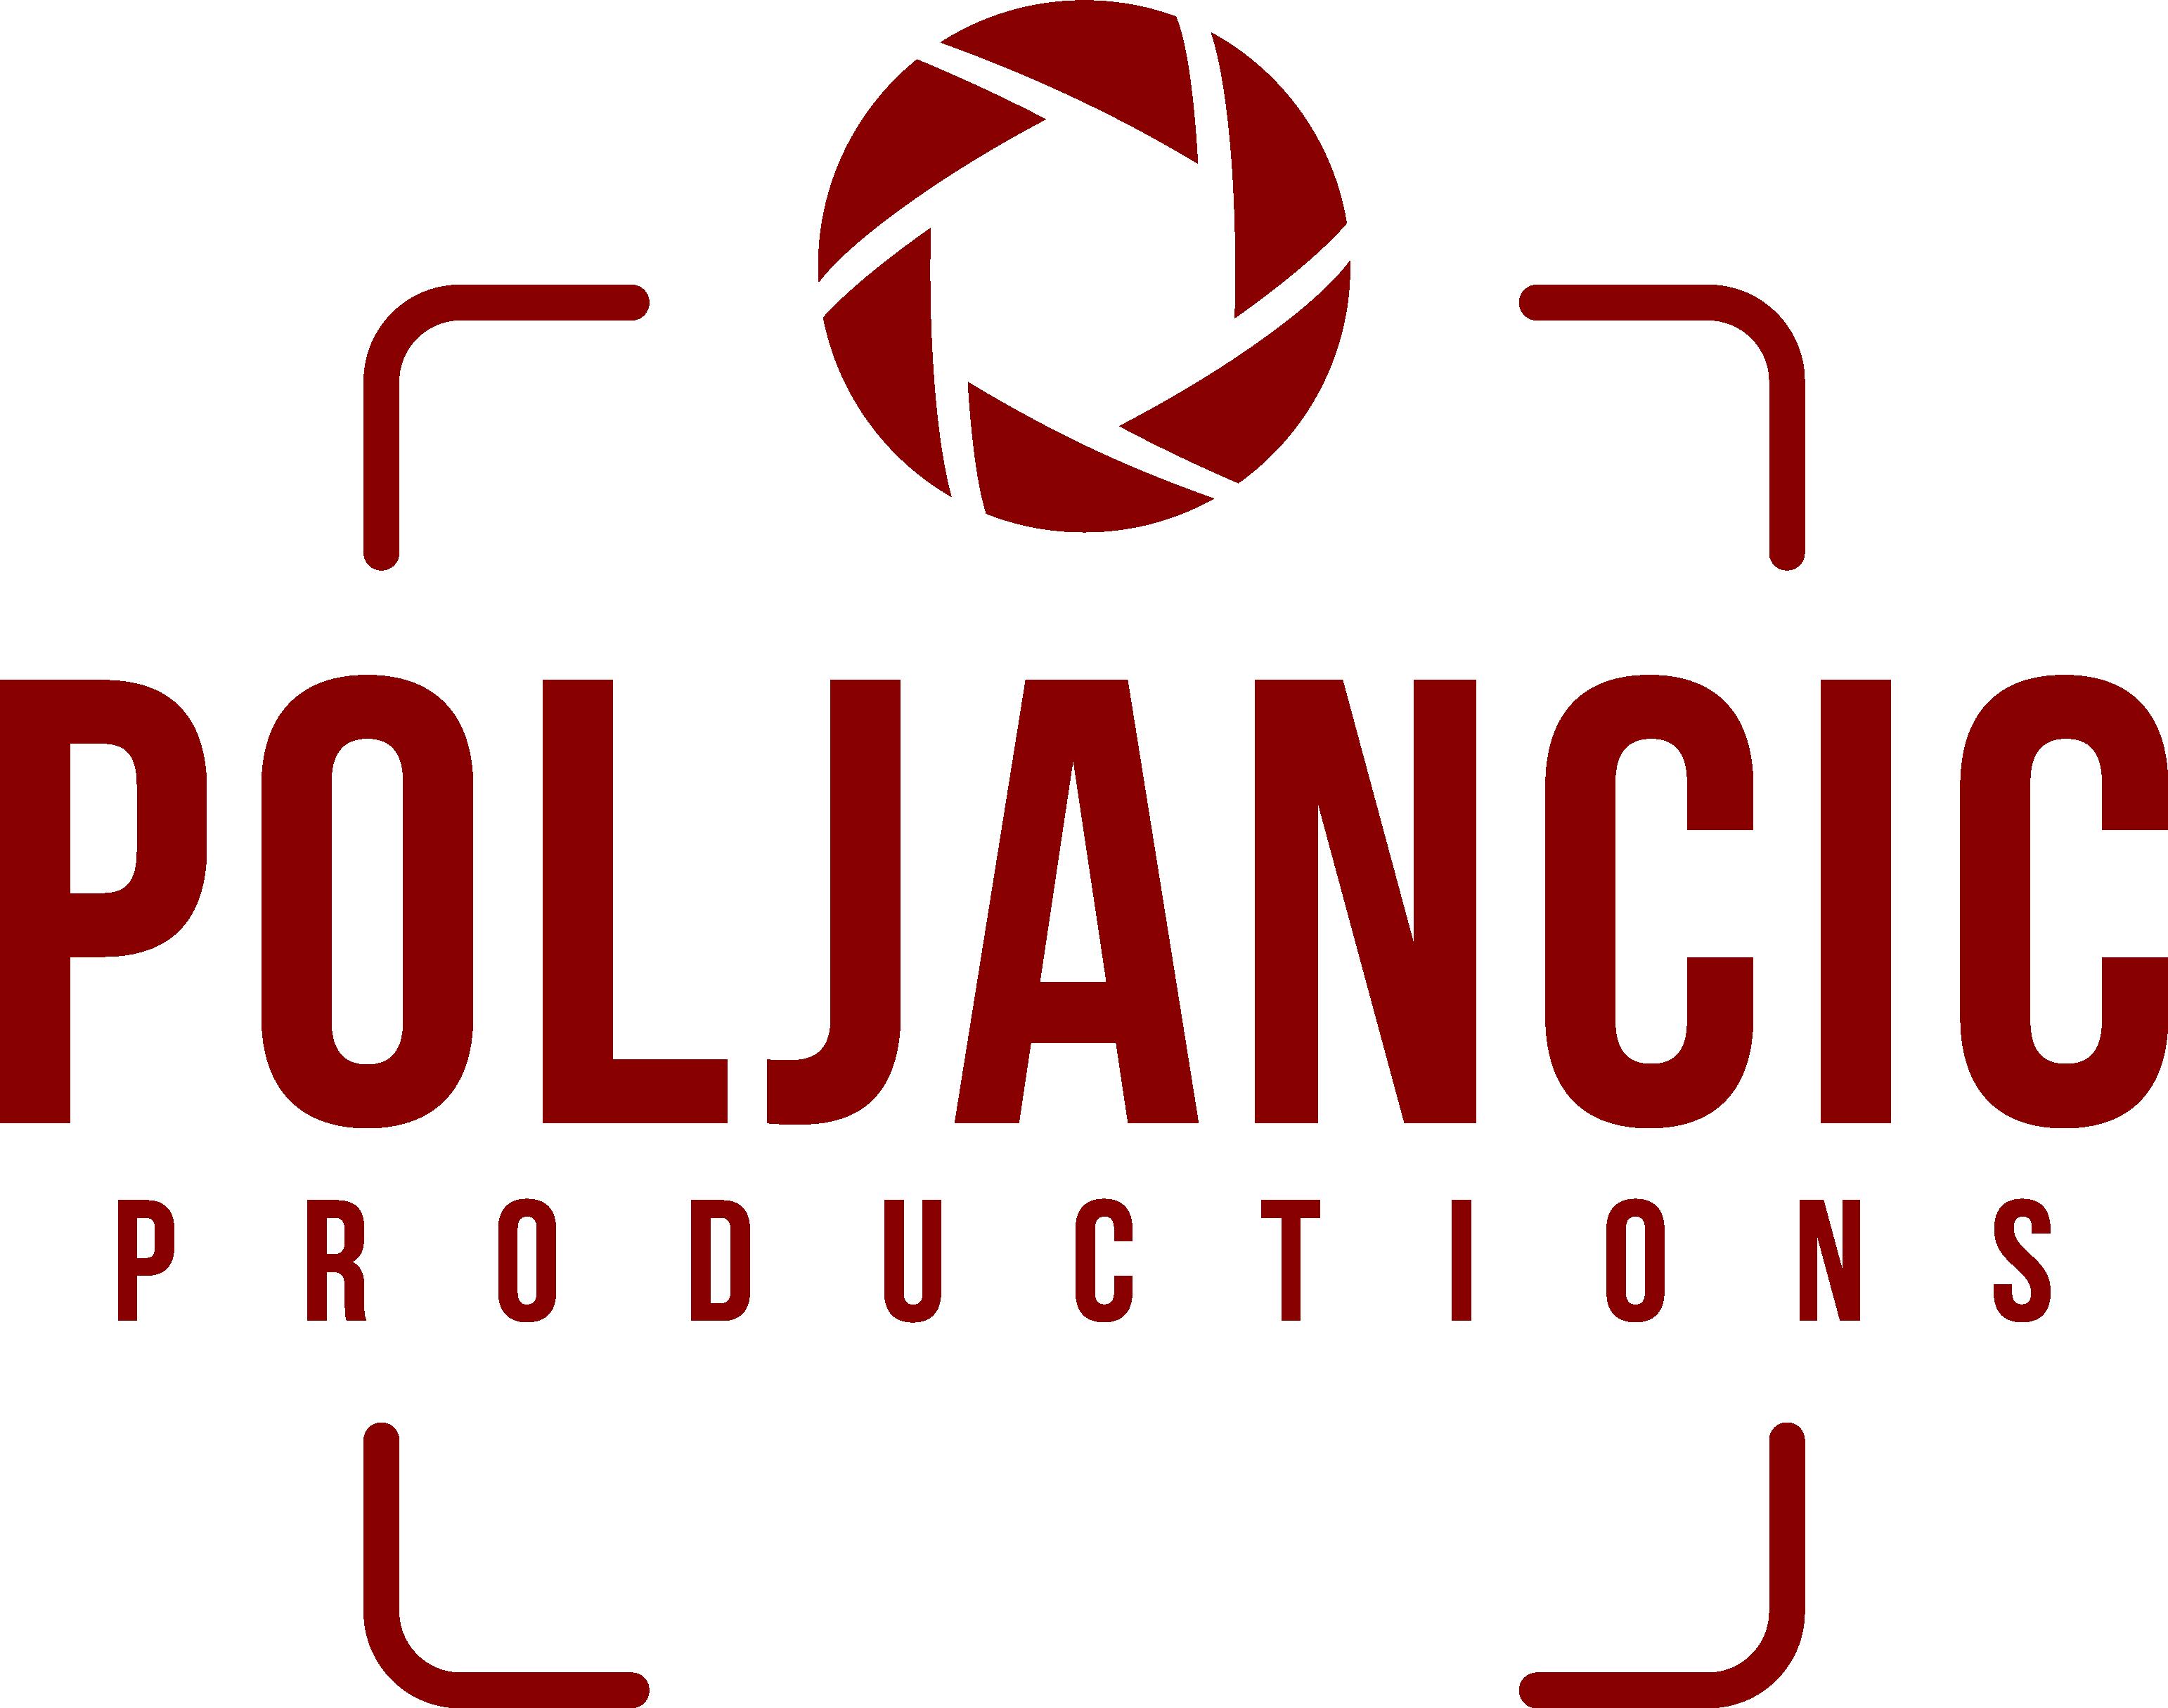 Poljancic Productions